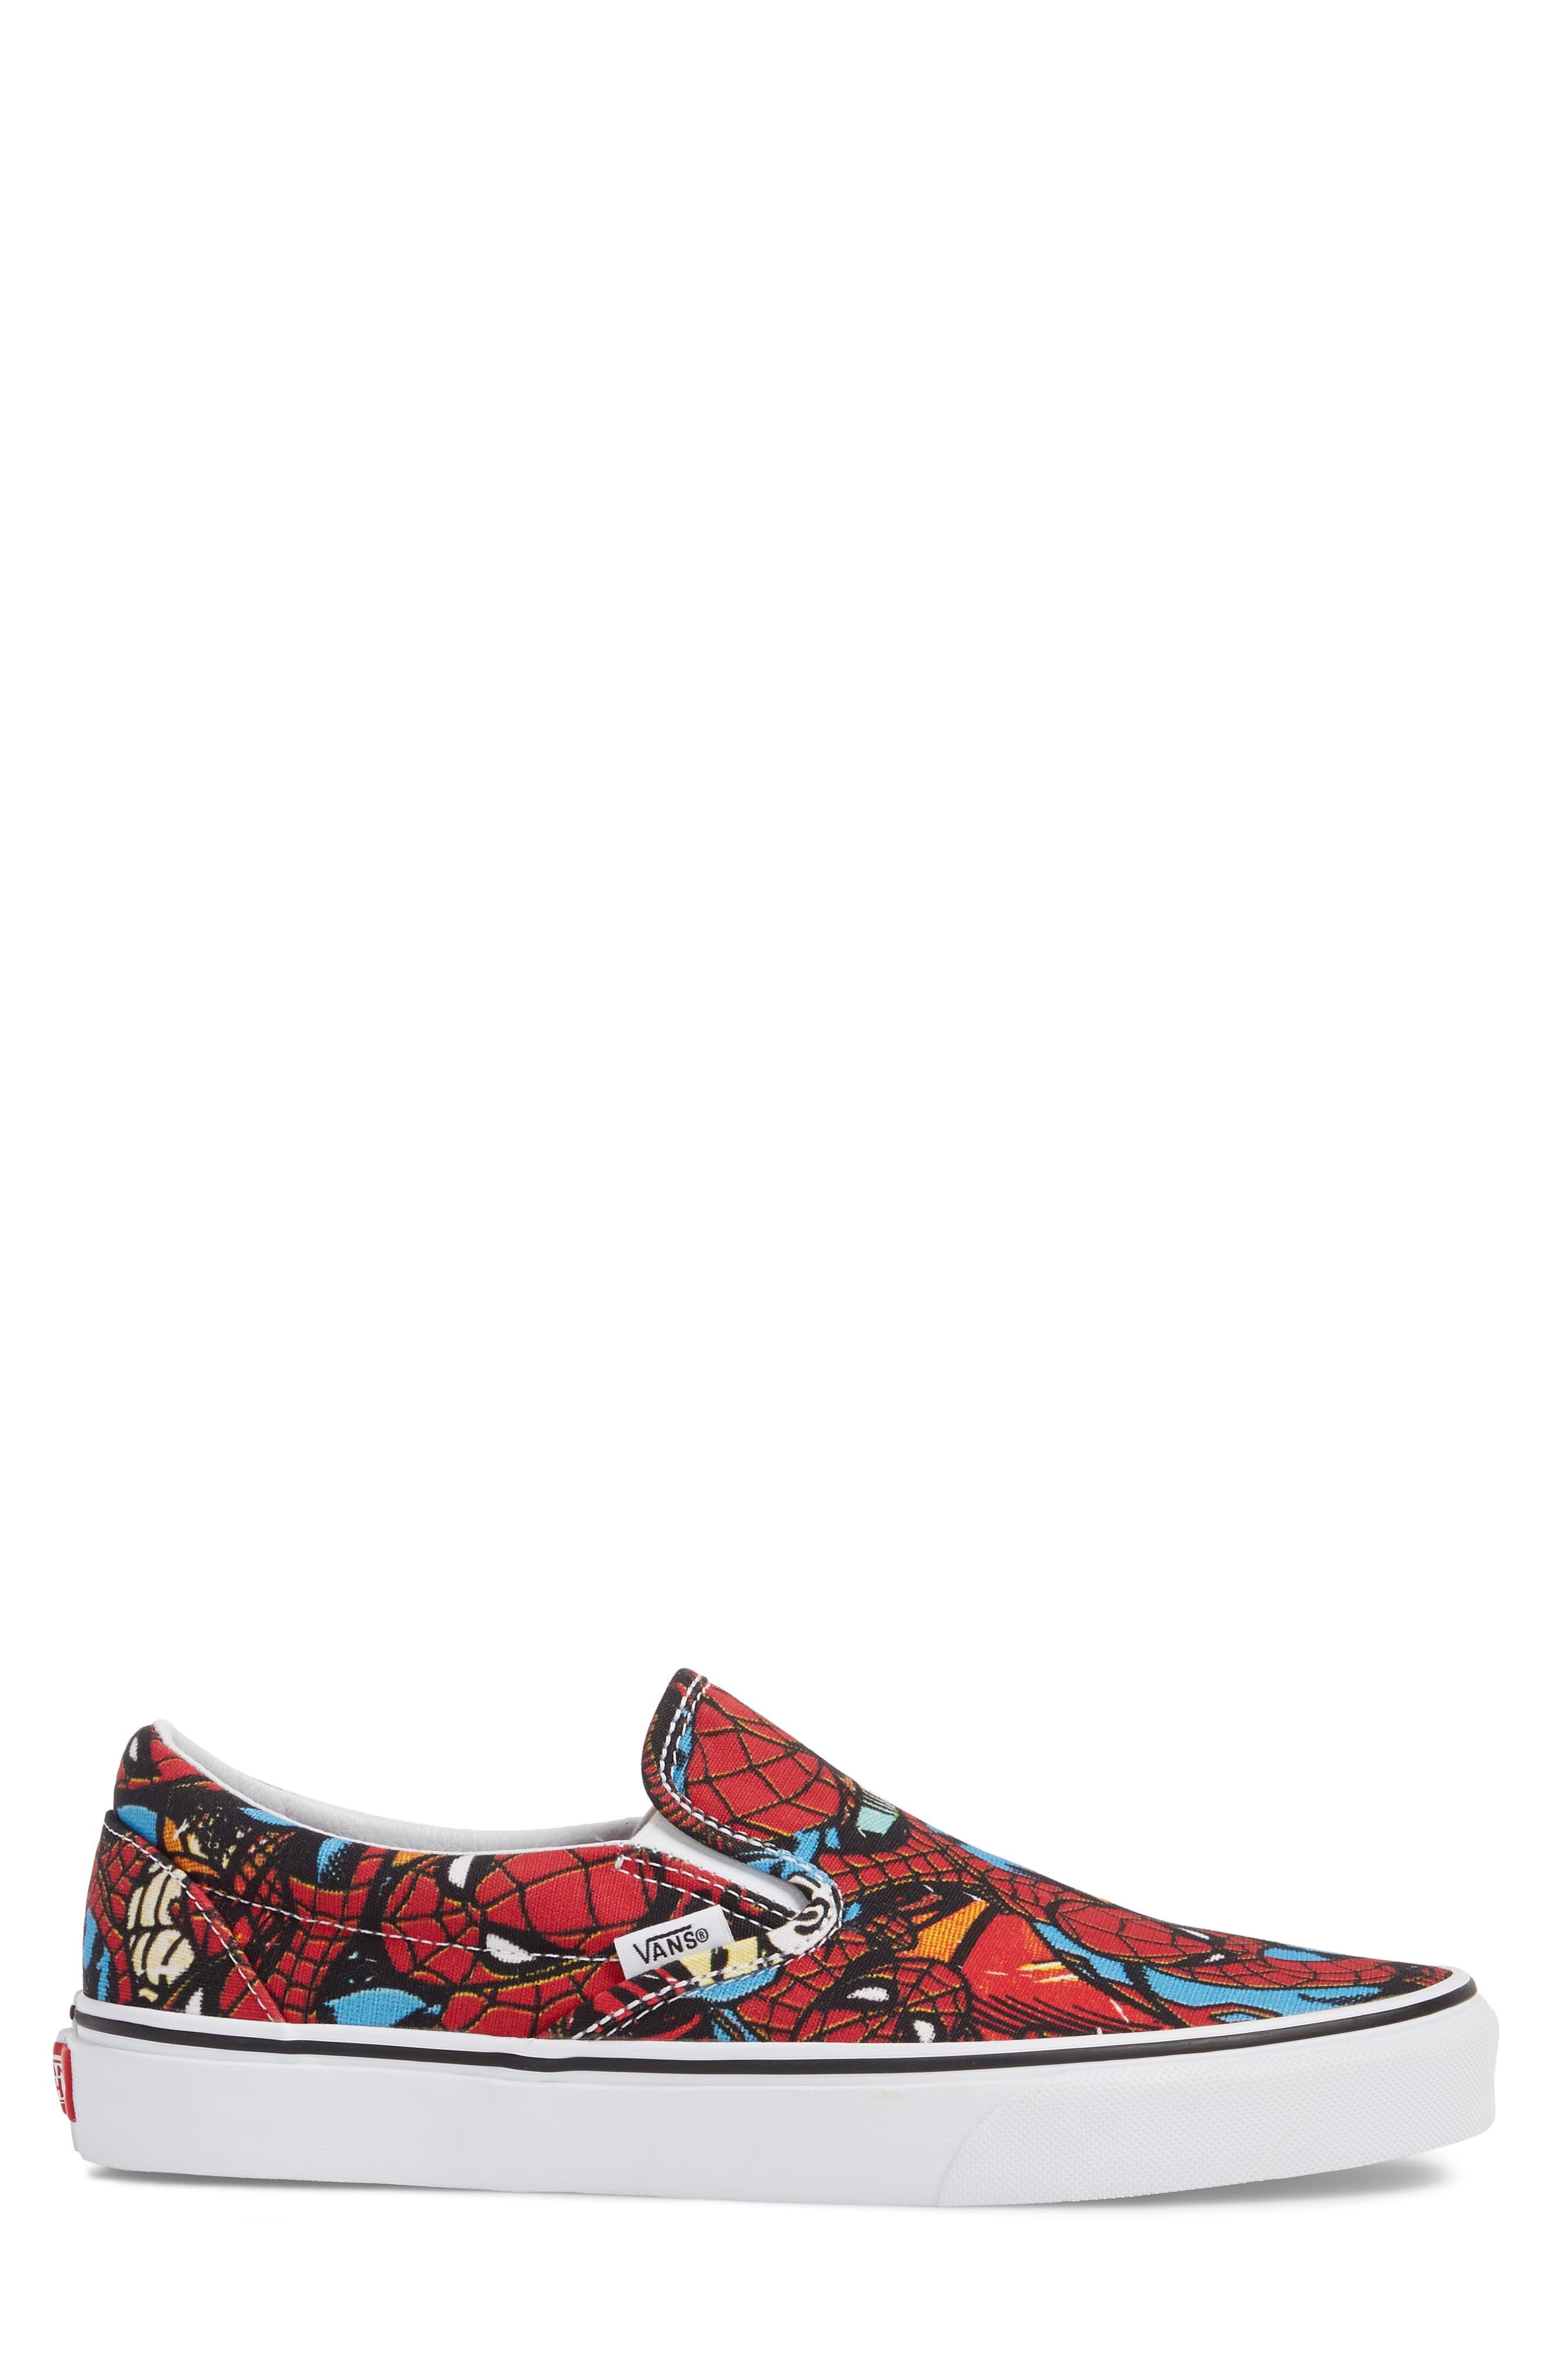 Marvel UA Classic Slip-On Sneaker,                             Alternate thumbnail 3, color,                             Black/ Red Textile